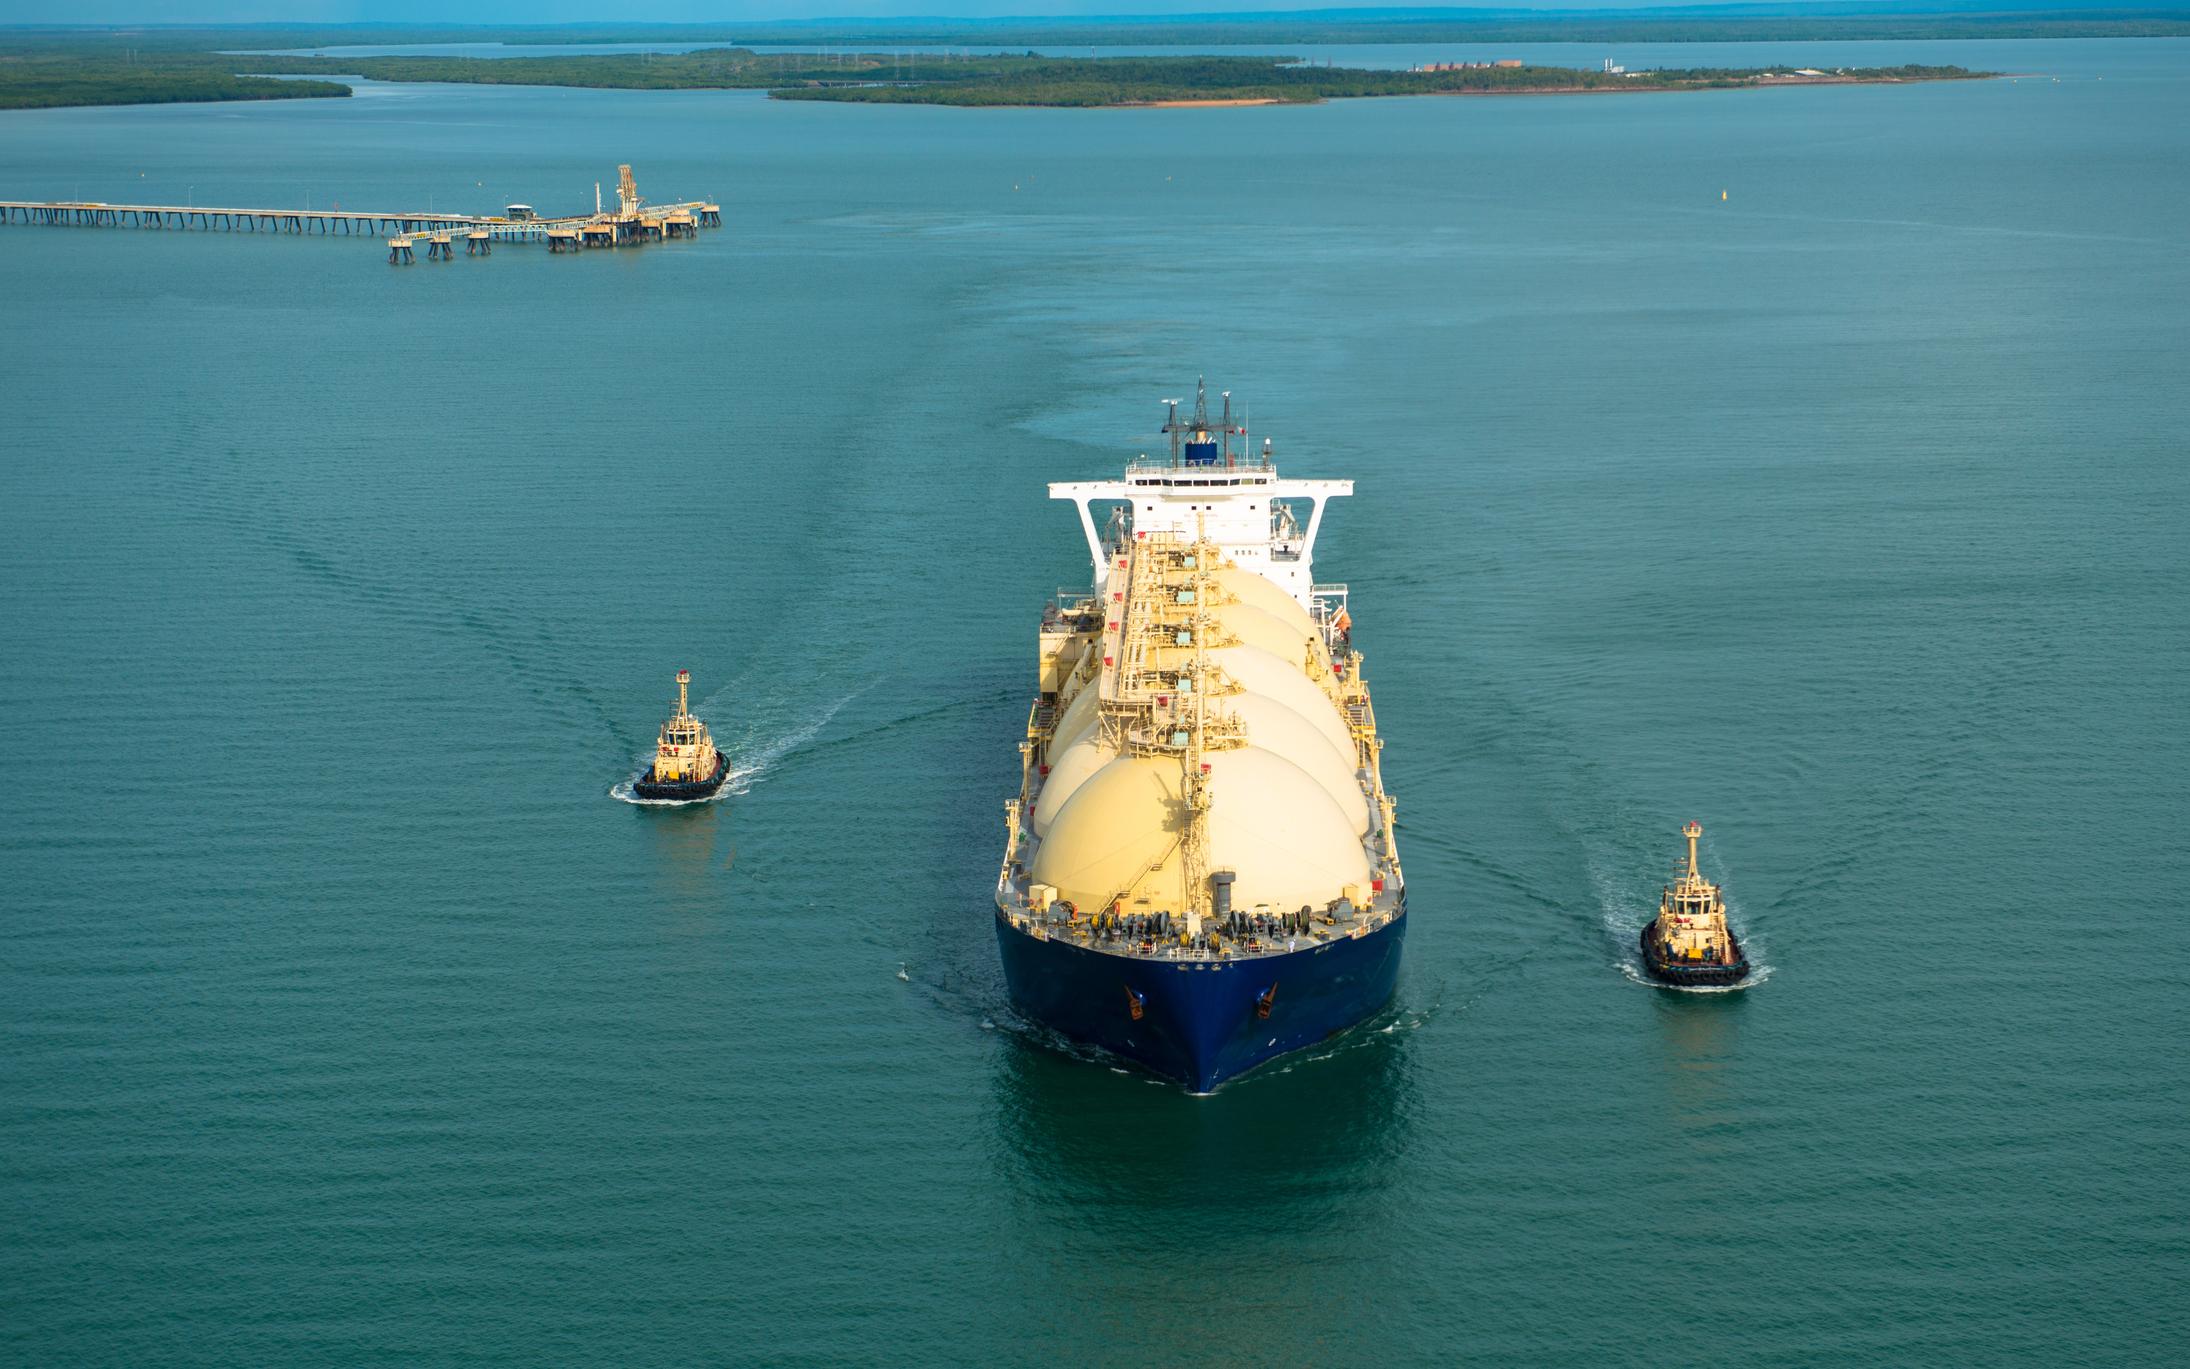 An LNG tanker leaving a port terminal.